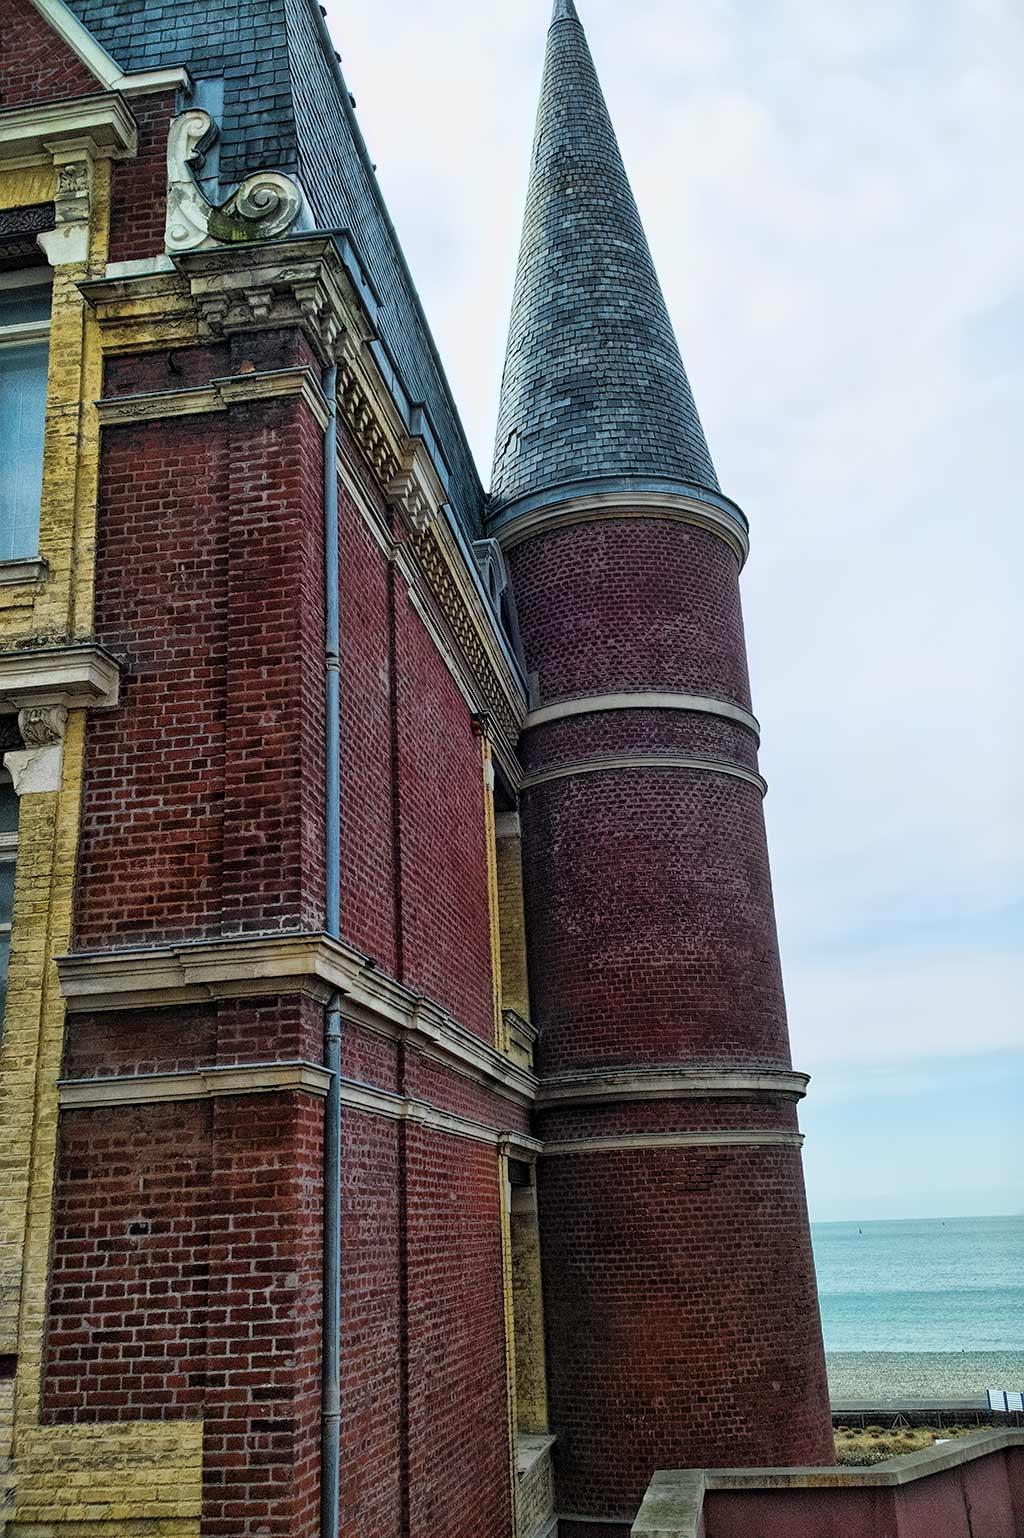 Turret of the Le Havre's Villa Maritime castle